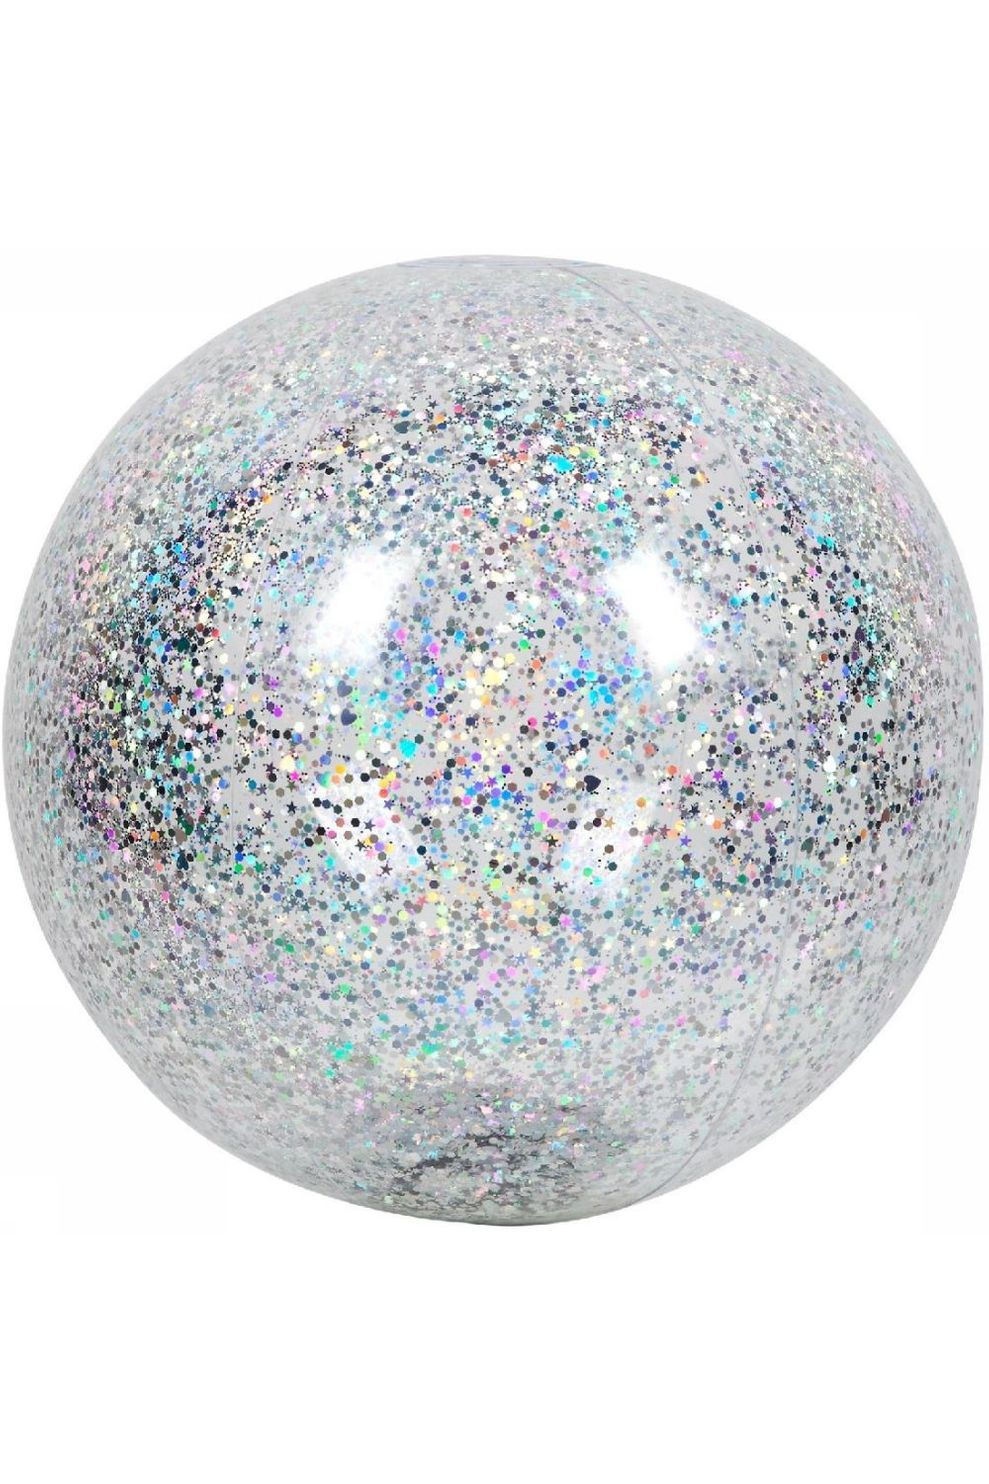 Sunnylife Speelgoed Inflatable Beach Ball Glitter - Grijs